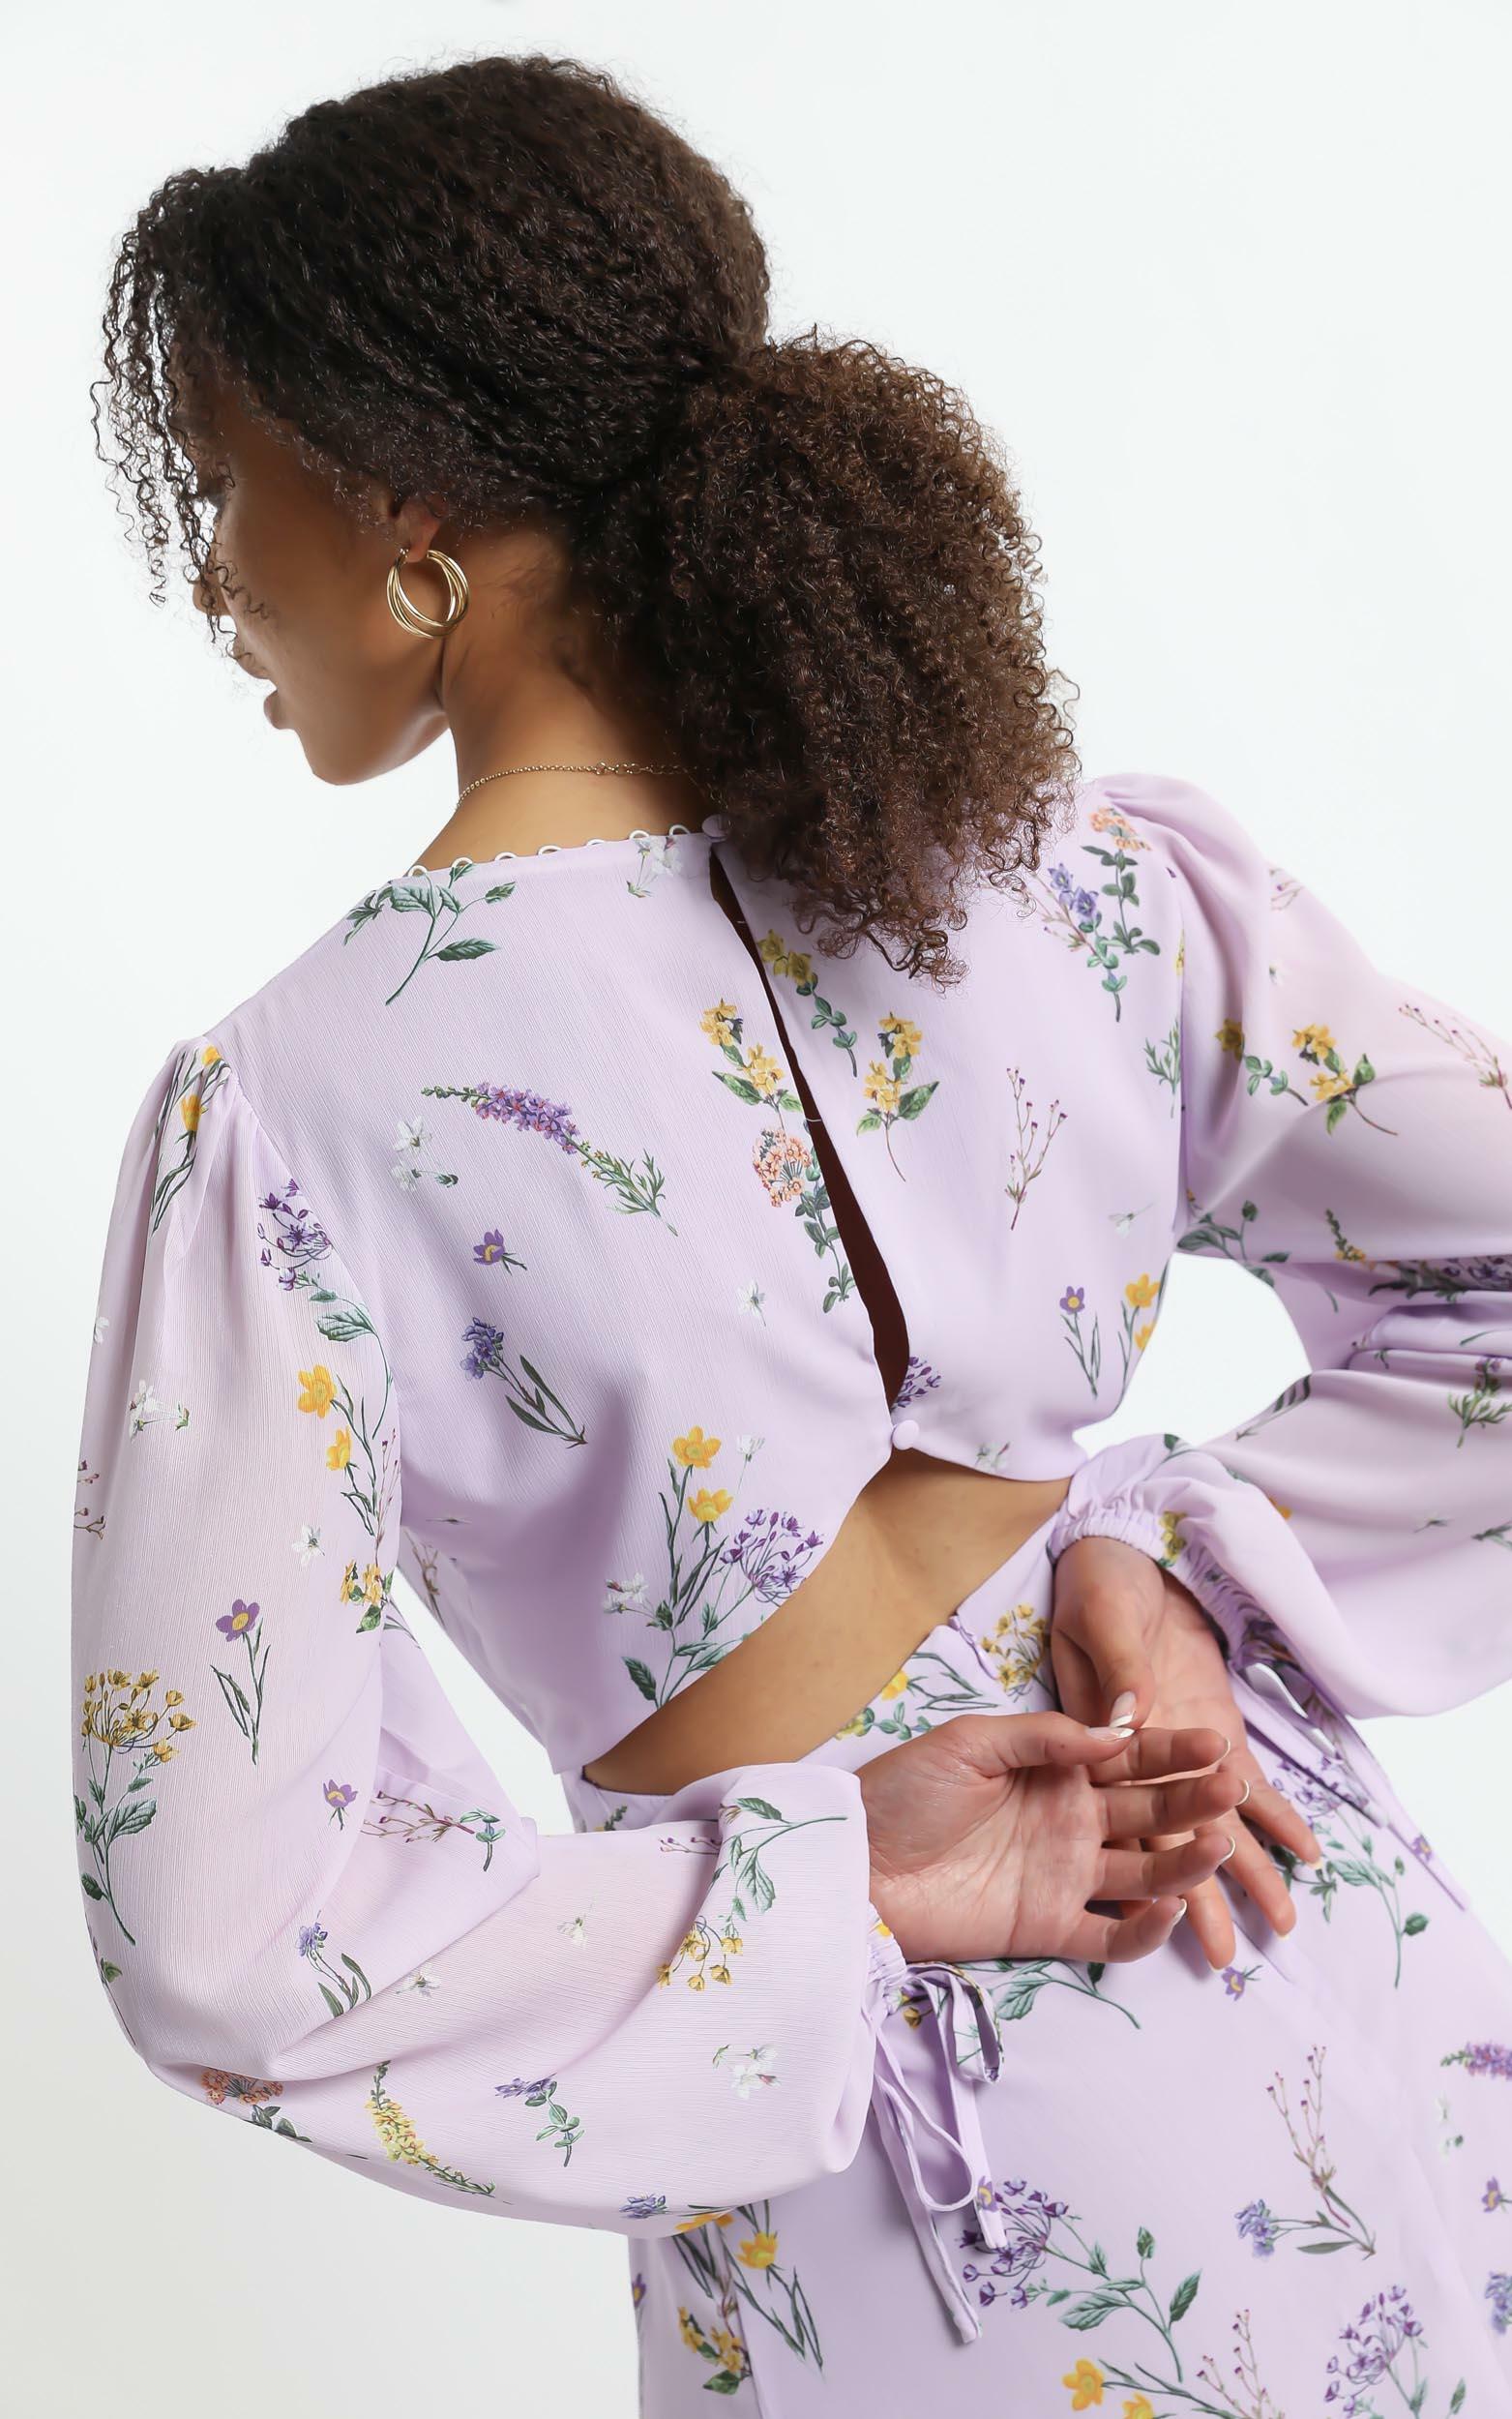 Andrea Dress in Lavender Botanical Floral - 6 (XS), Purple, hi-res image number null